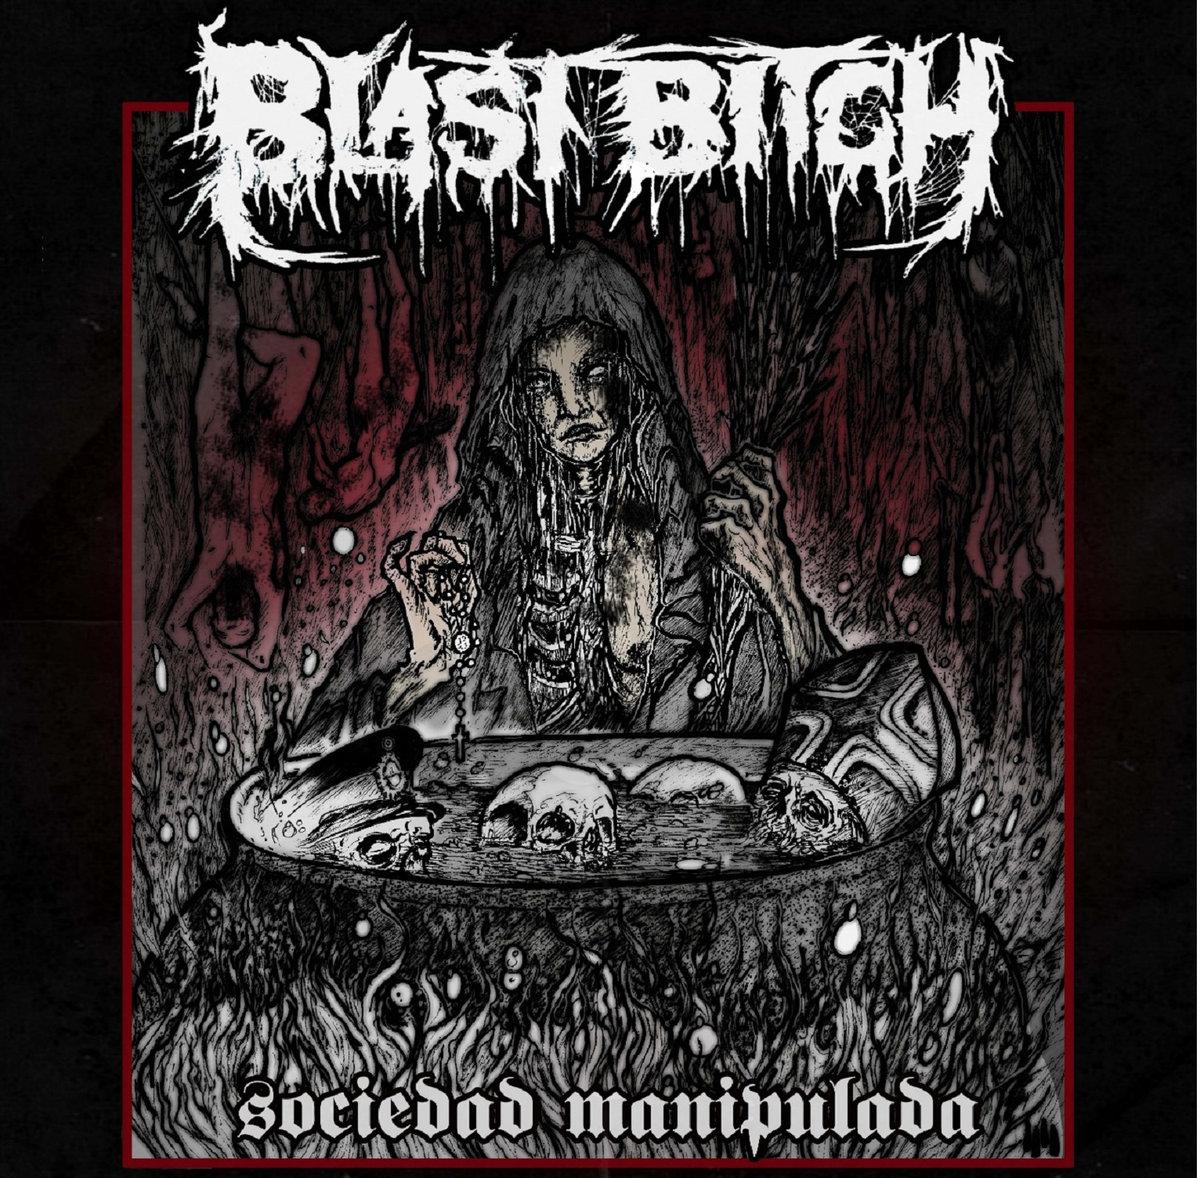 Sociedad Manipulada | Blast Bitch